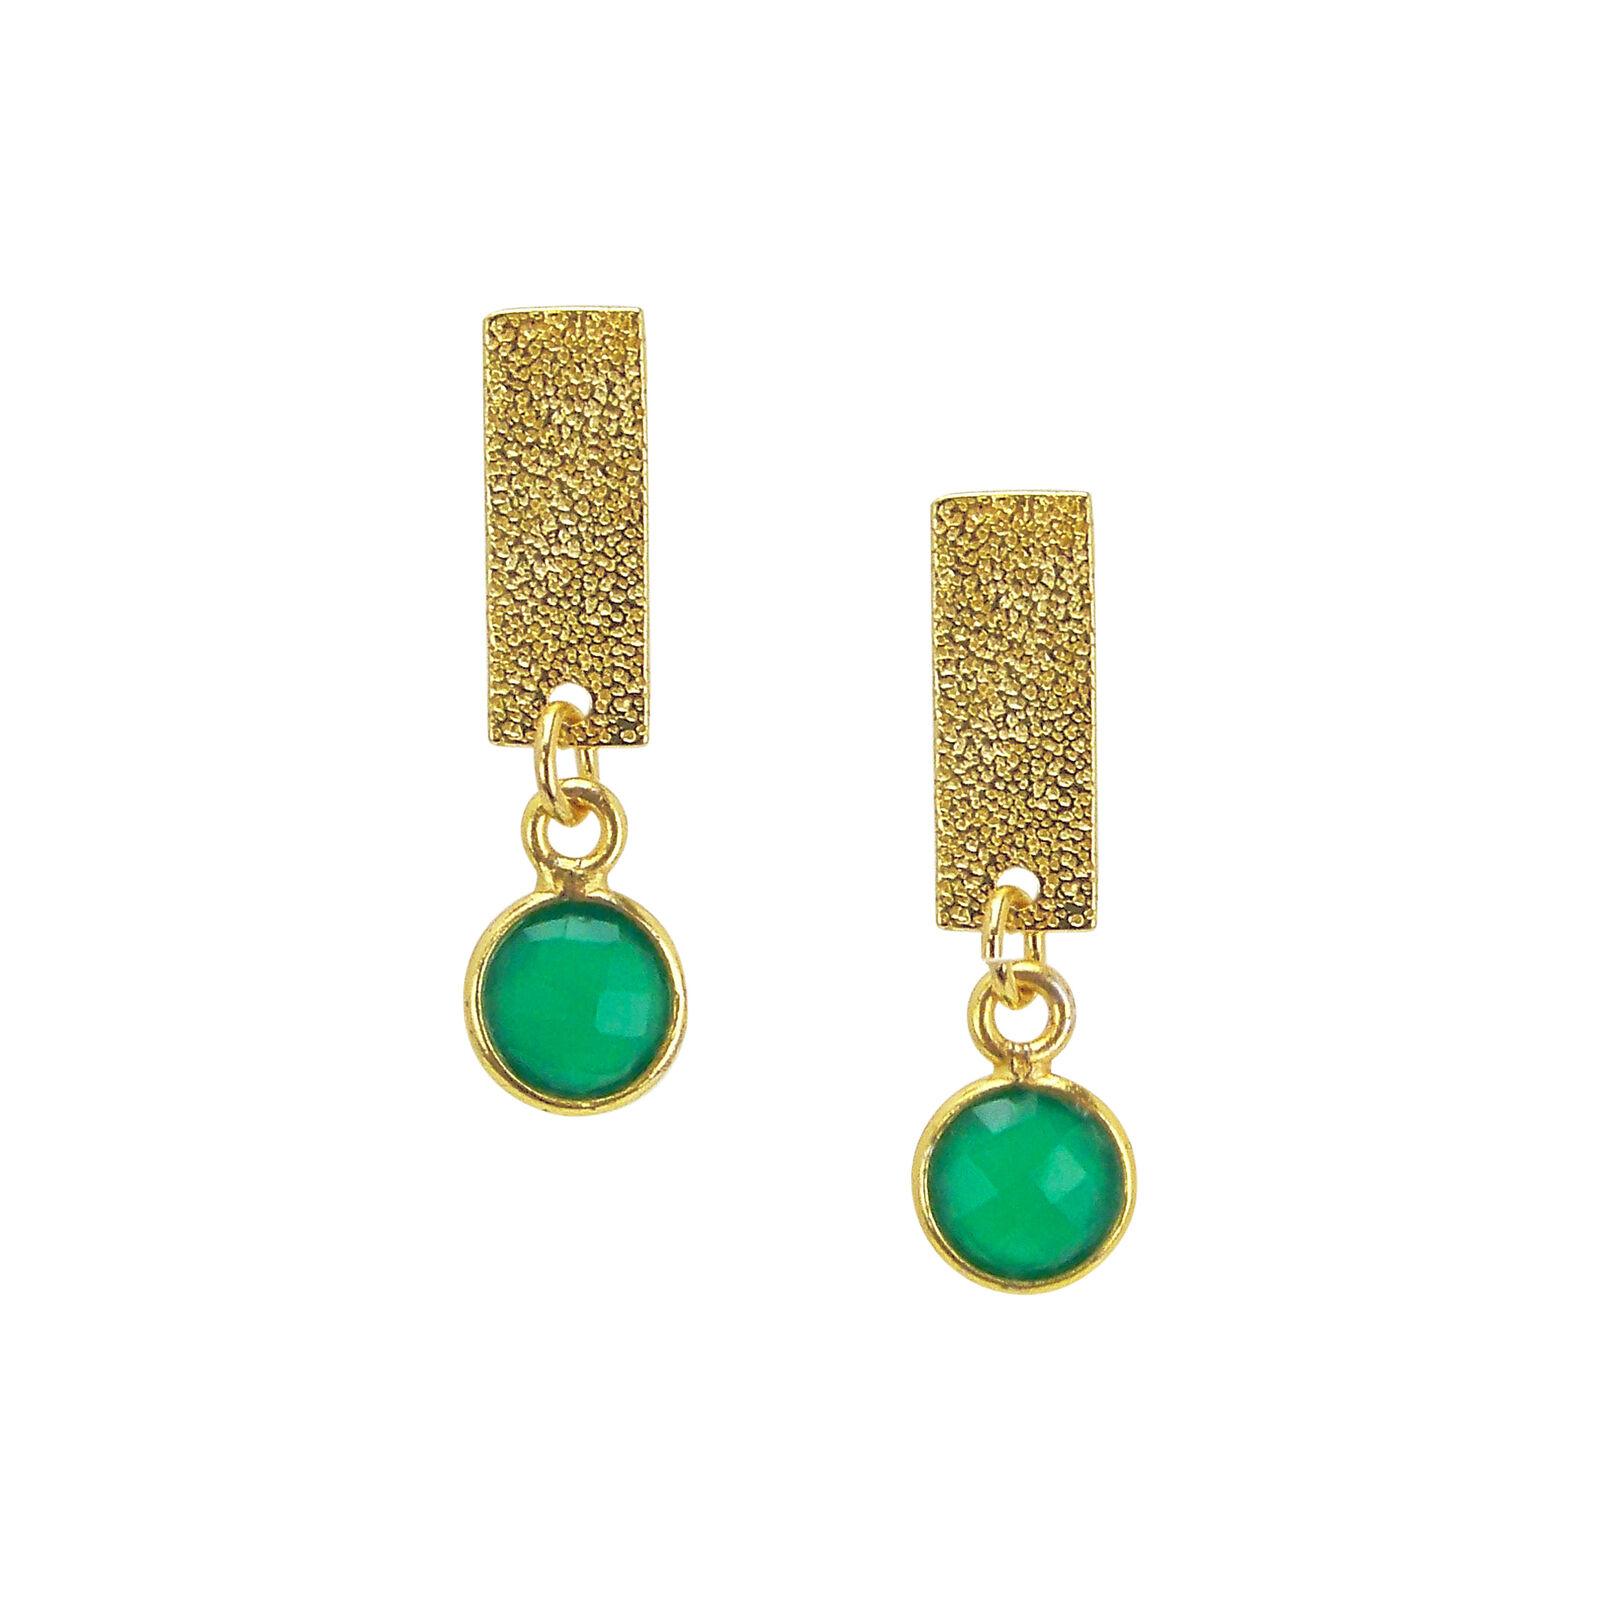 Charlene K Dangle Bar and Green Charm Earrings in gold Vermeil